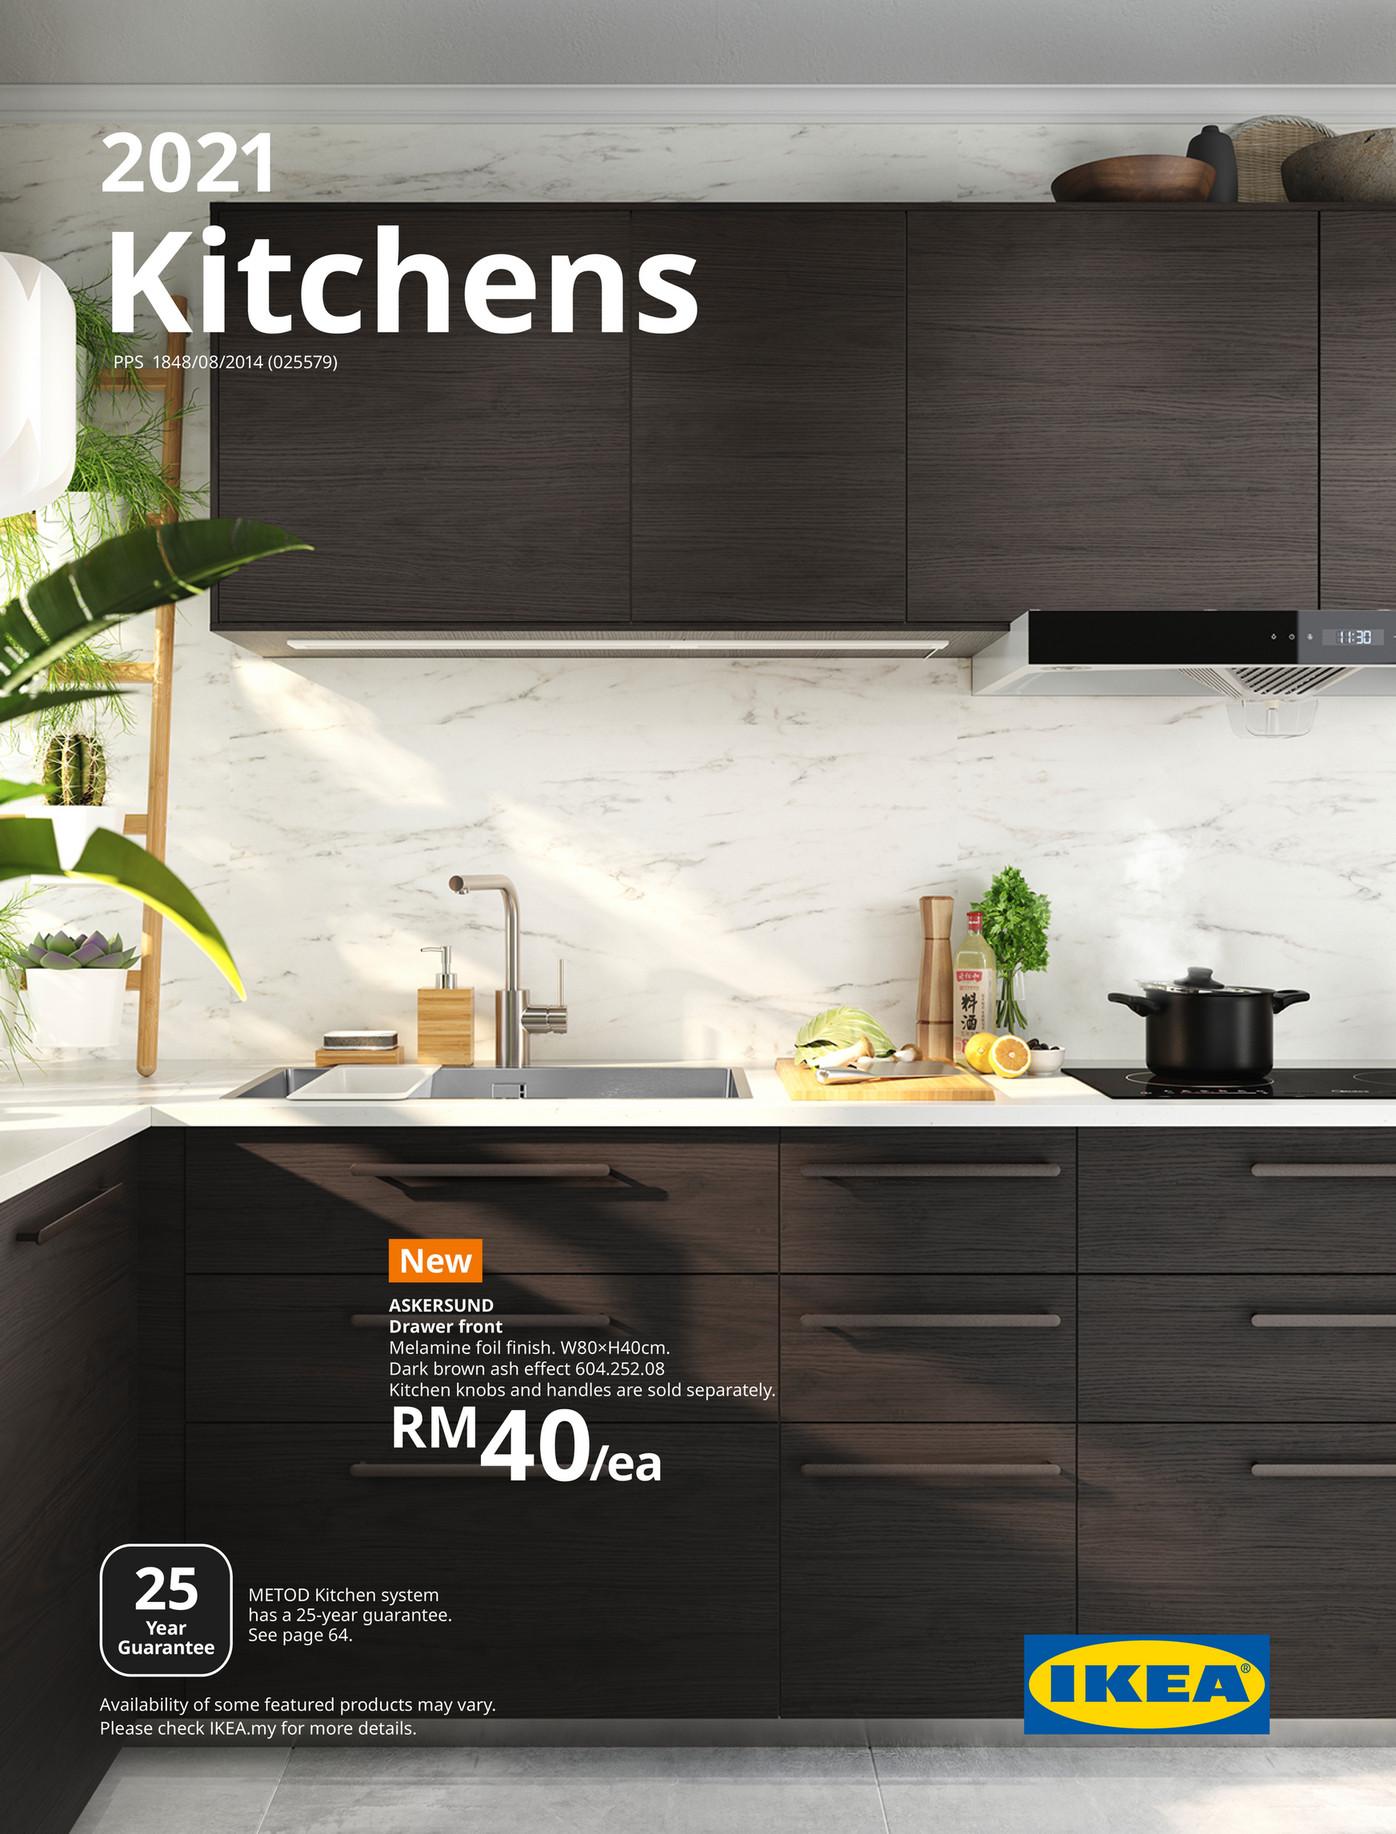 IKEA Kitchens 2021   Page 1